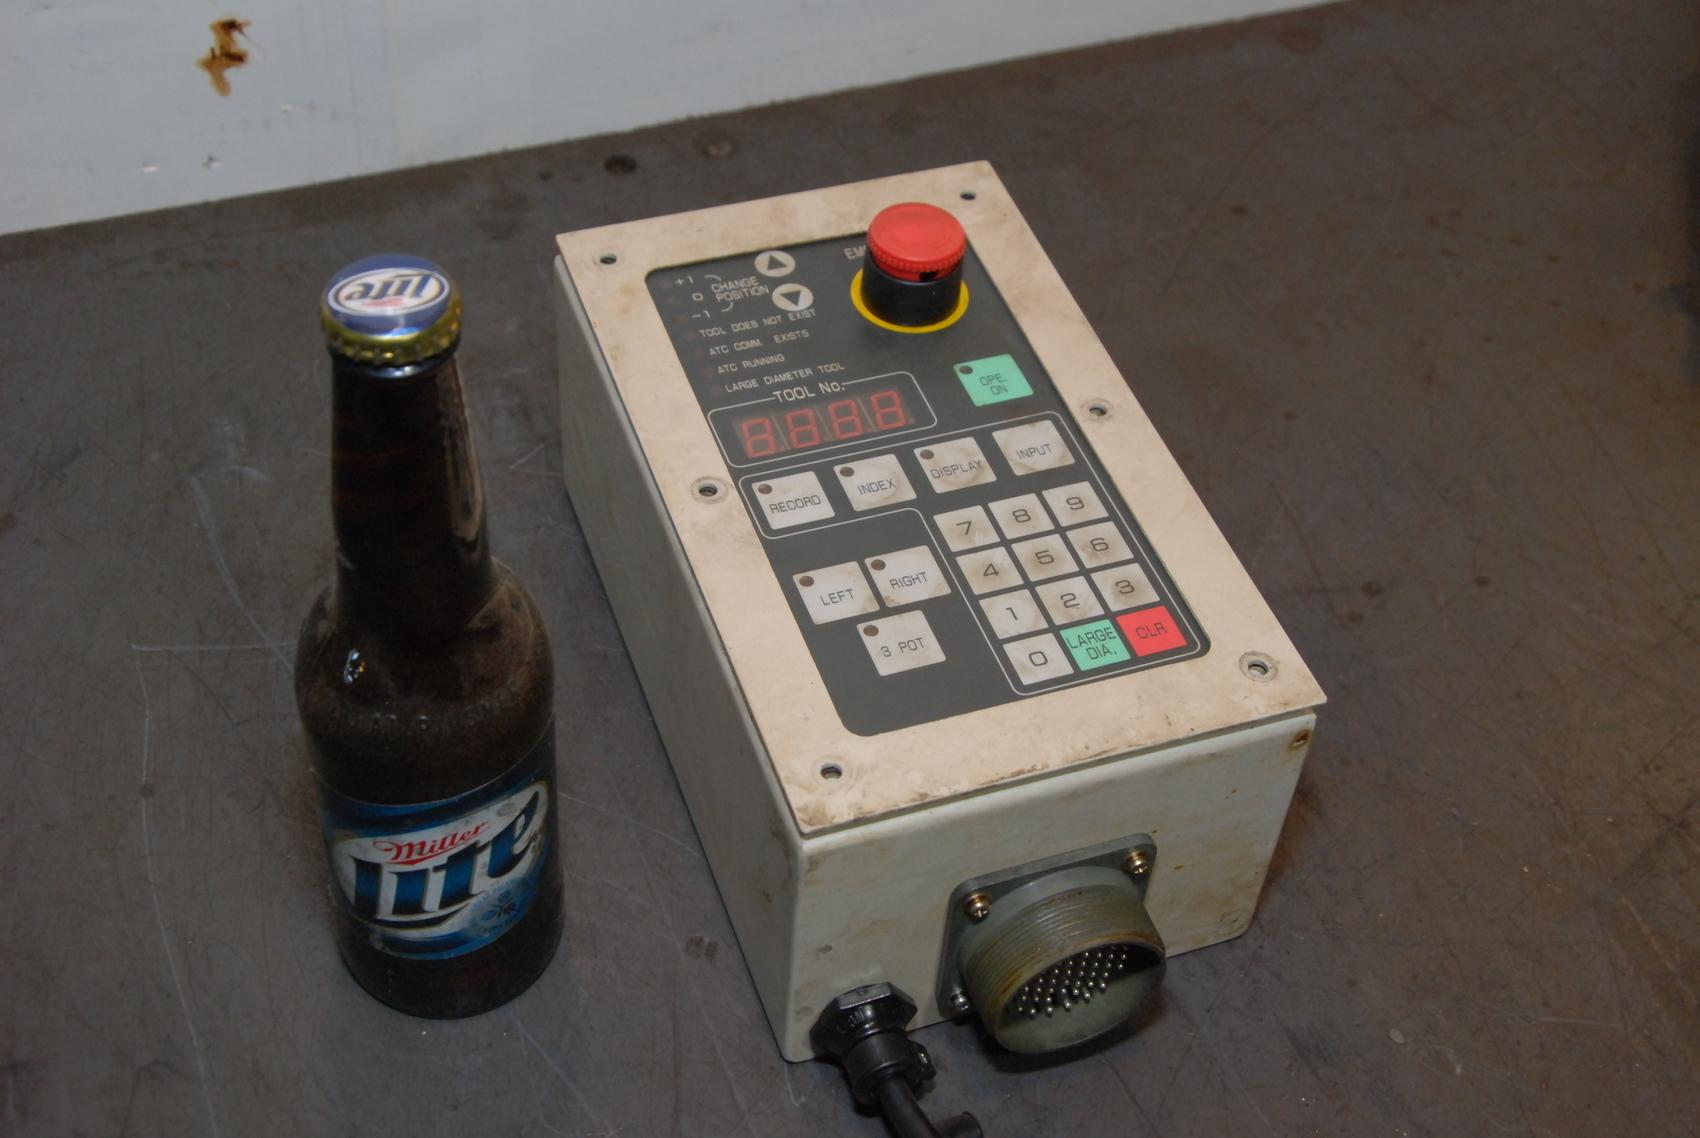 FUJI ELECTRIC FE AB12C-6027 F329 73 42(3)B EMERGENCY STOP PANEL